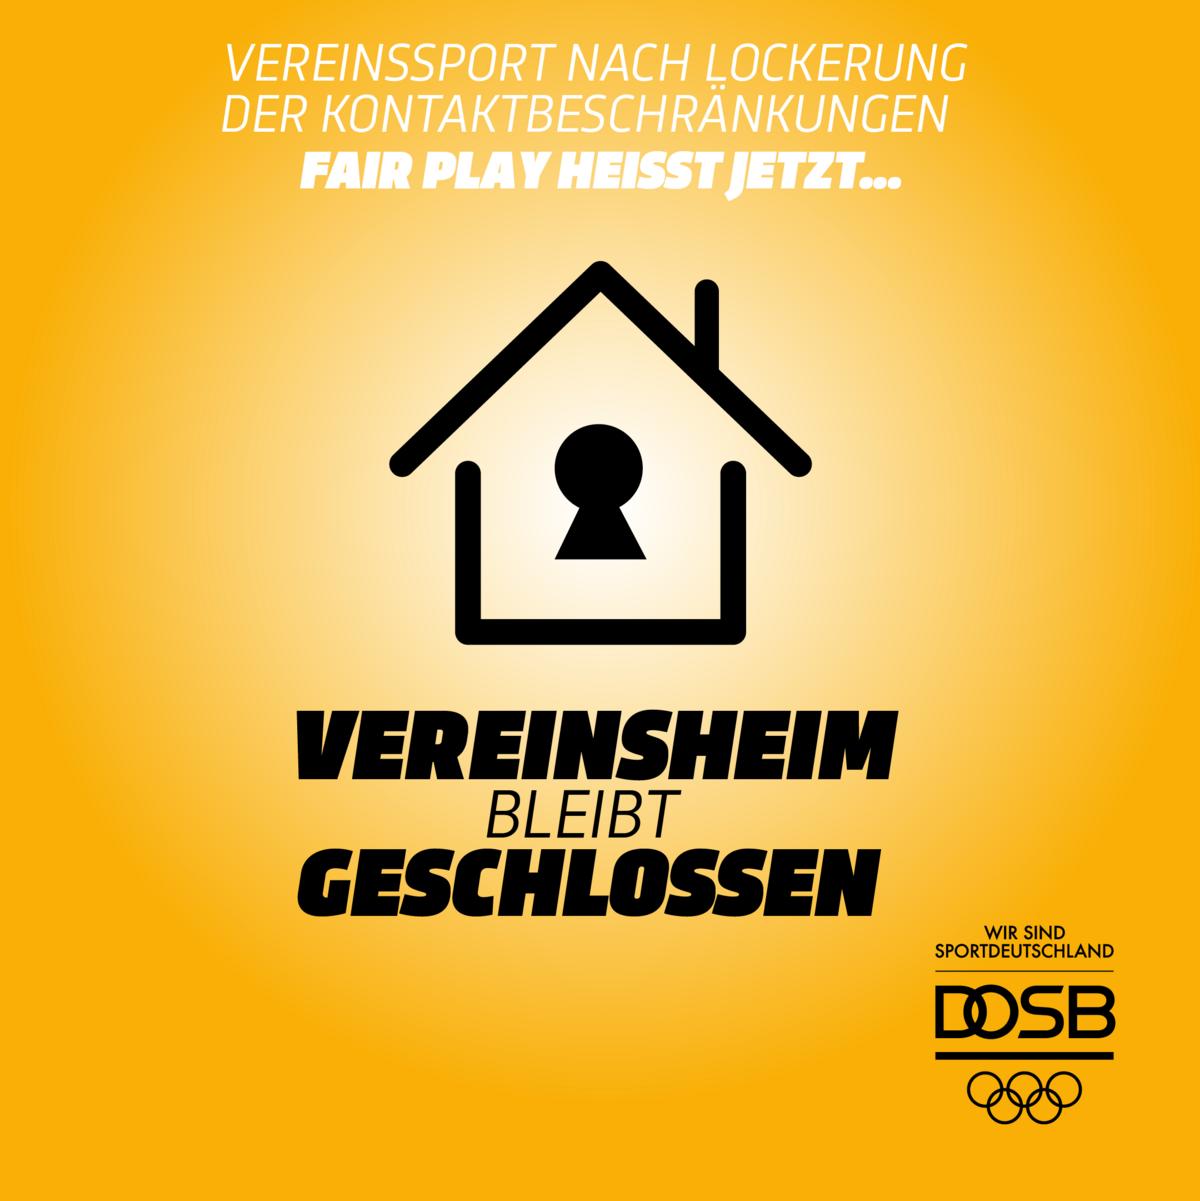 csm_Leitplanken-11_2x_dcebeacaab